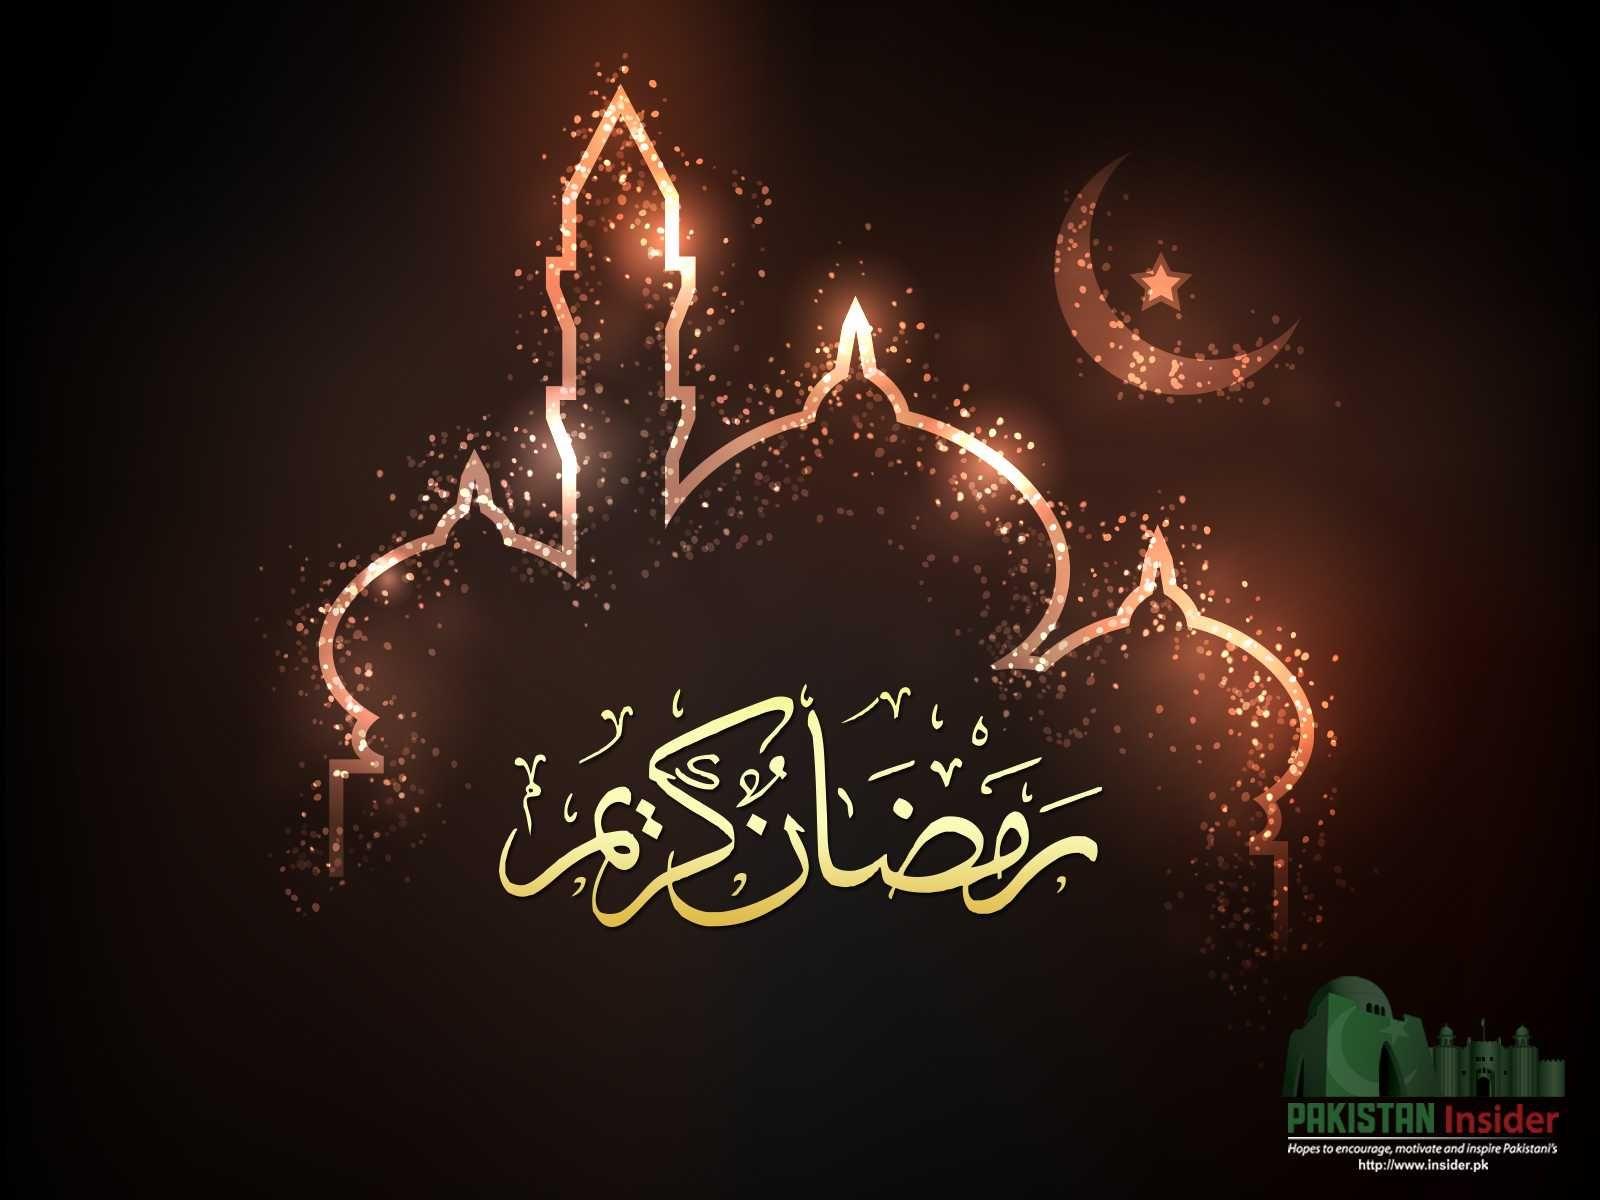 Ramadan Wallpapers Ramzan Wallpaper Hd Wallpapers 1080p Islamic Wallpaper Hd